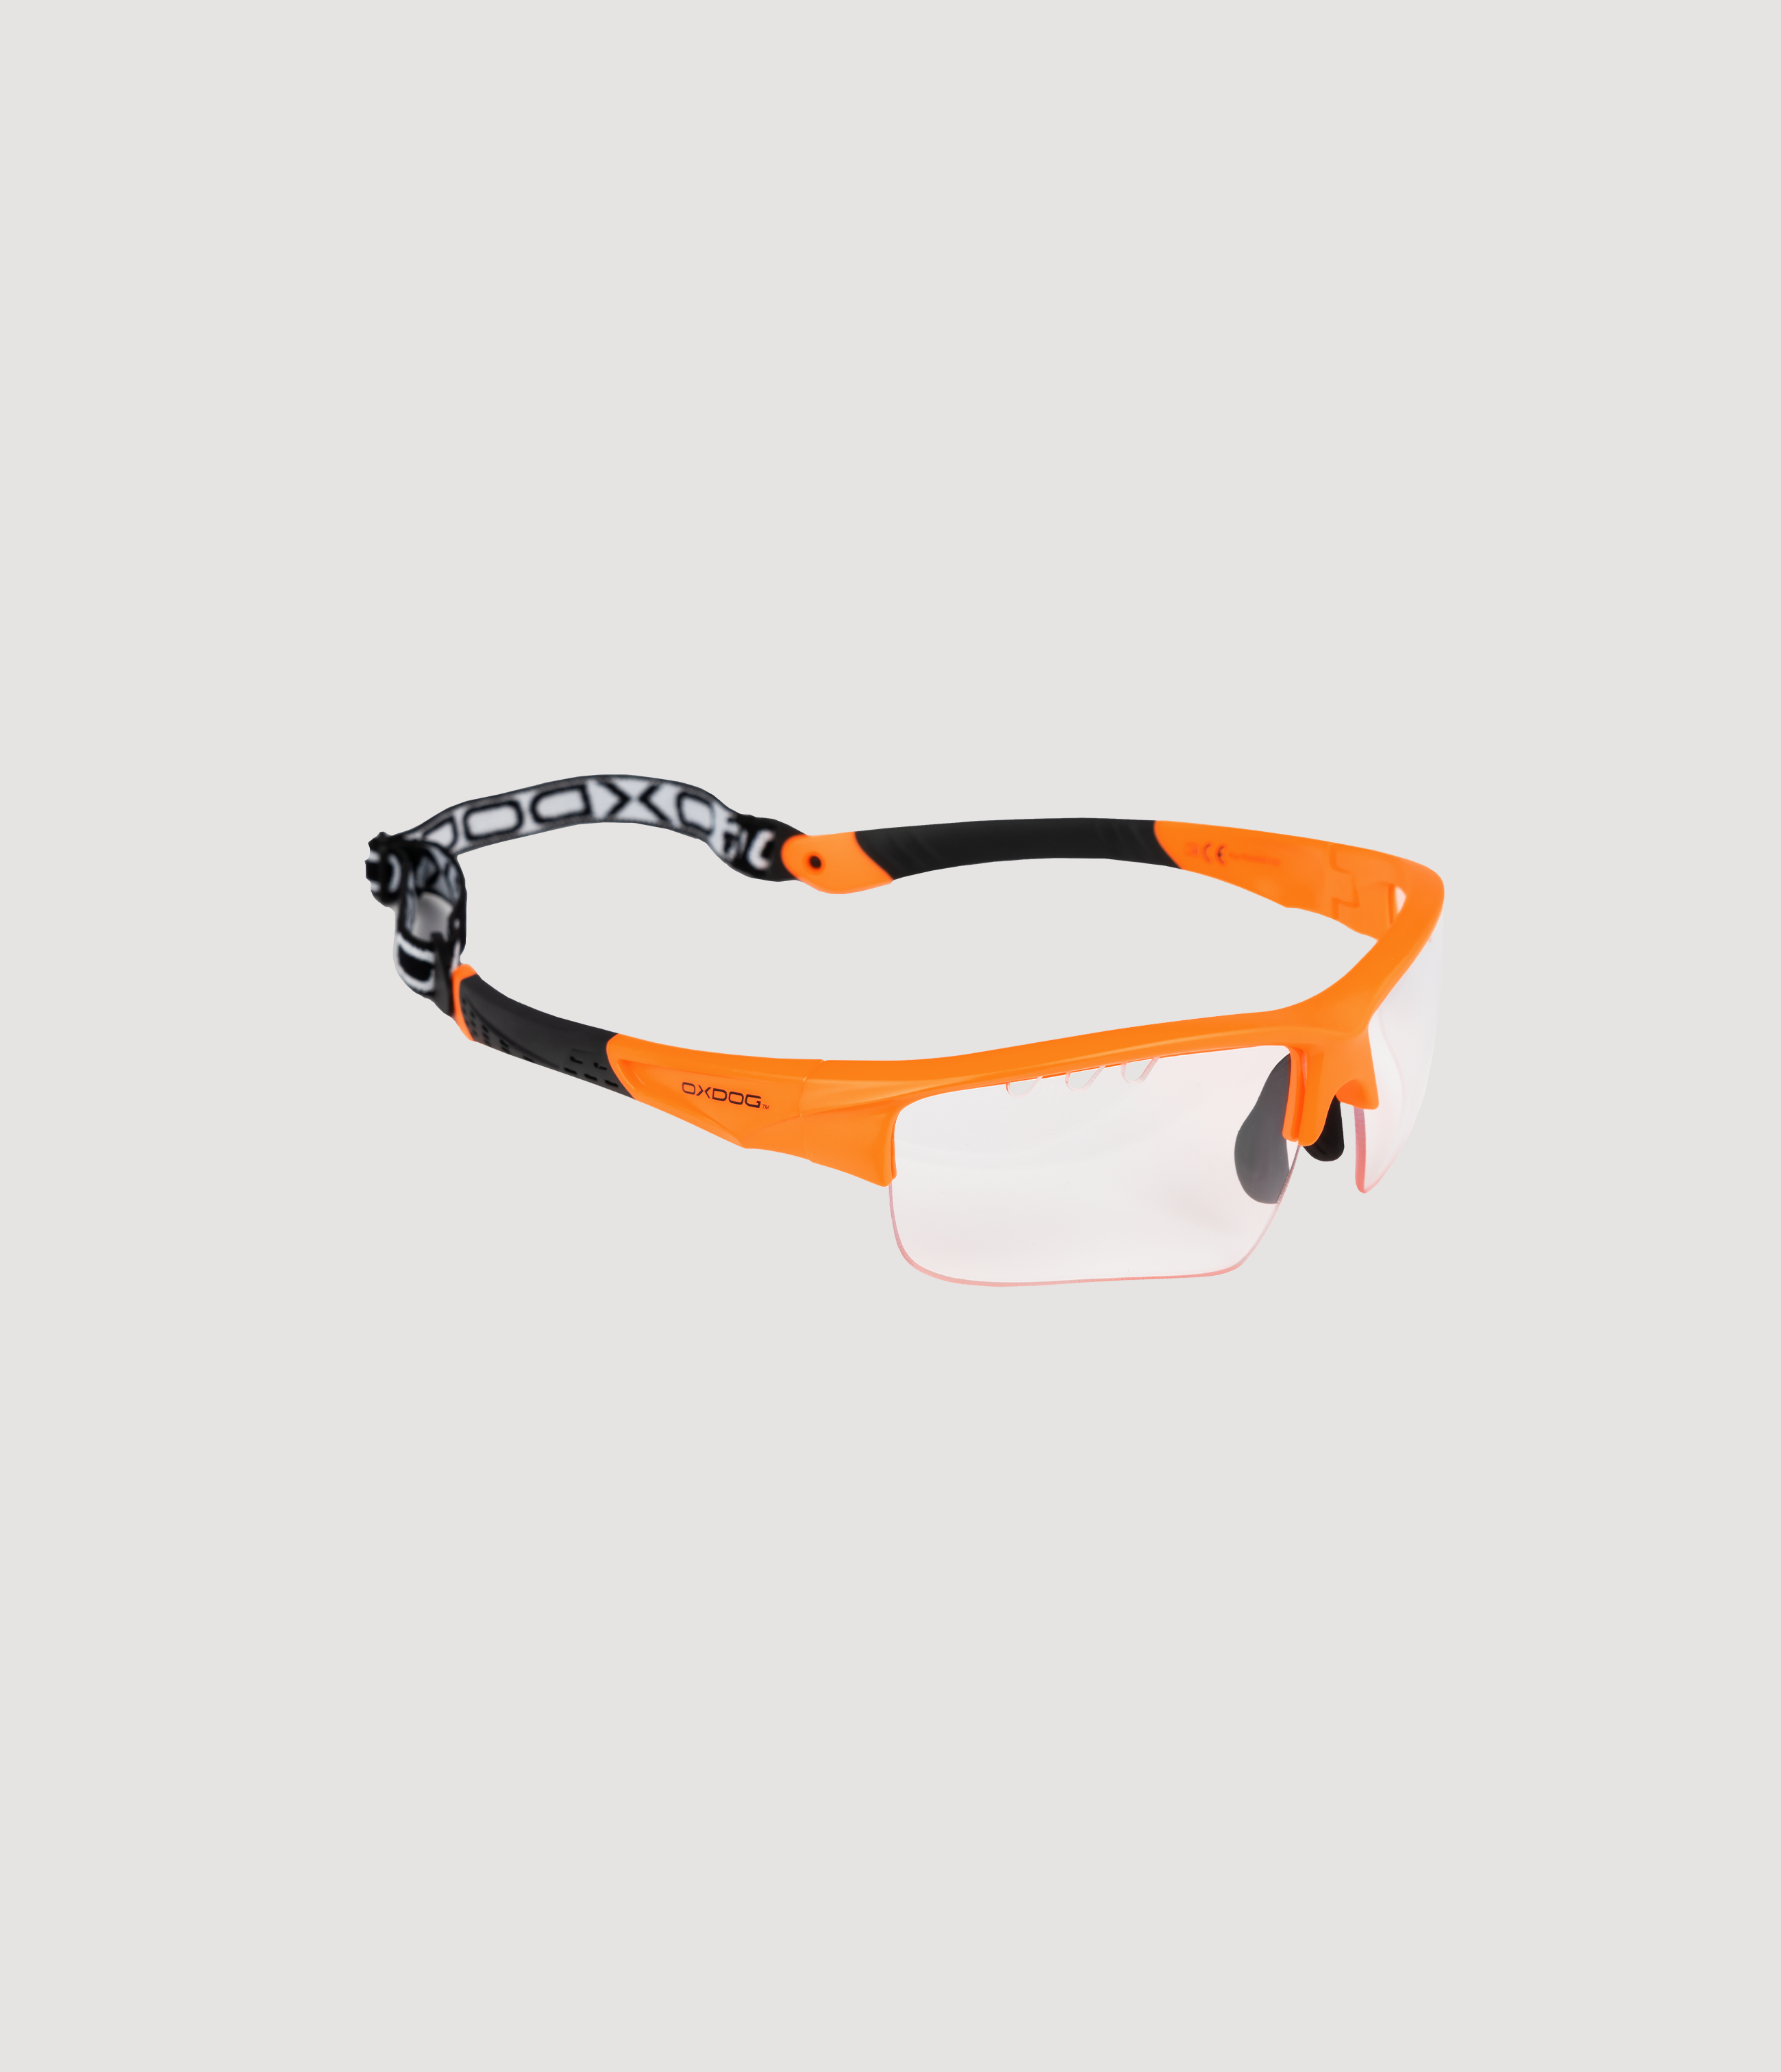 Spectrum Eyewear Orange Strap